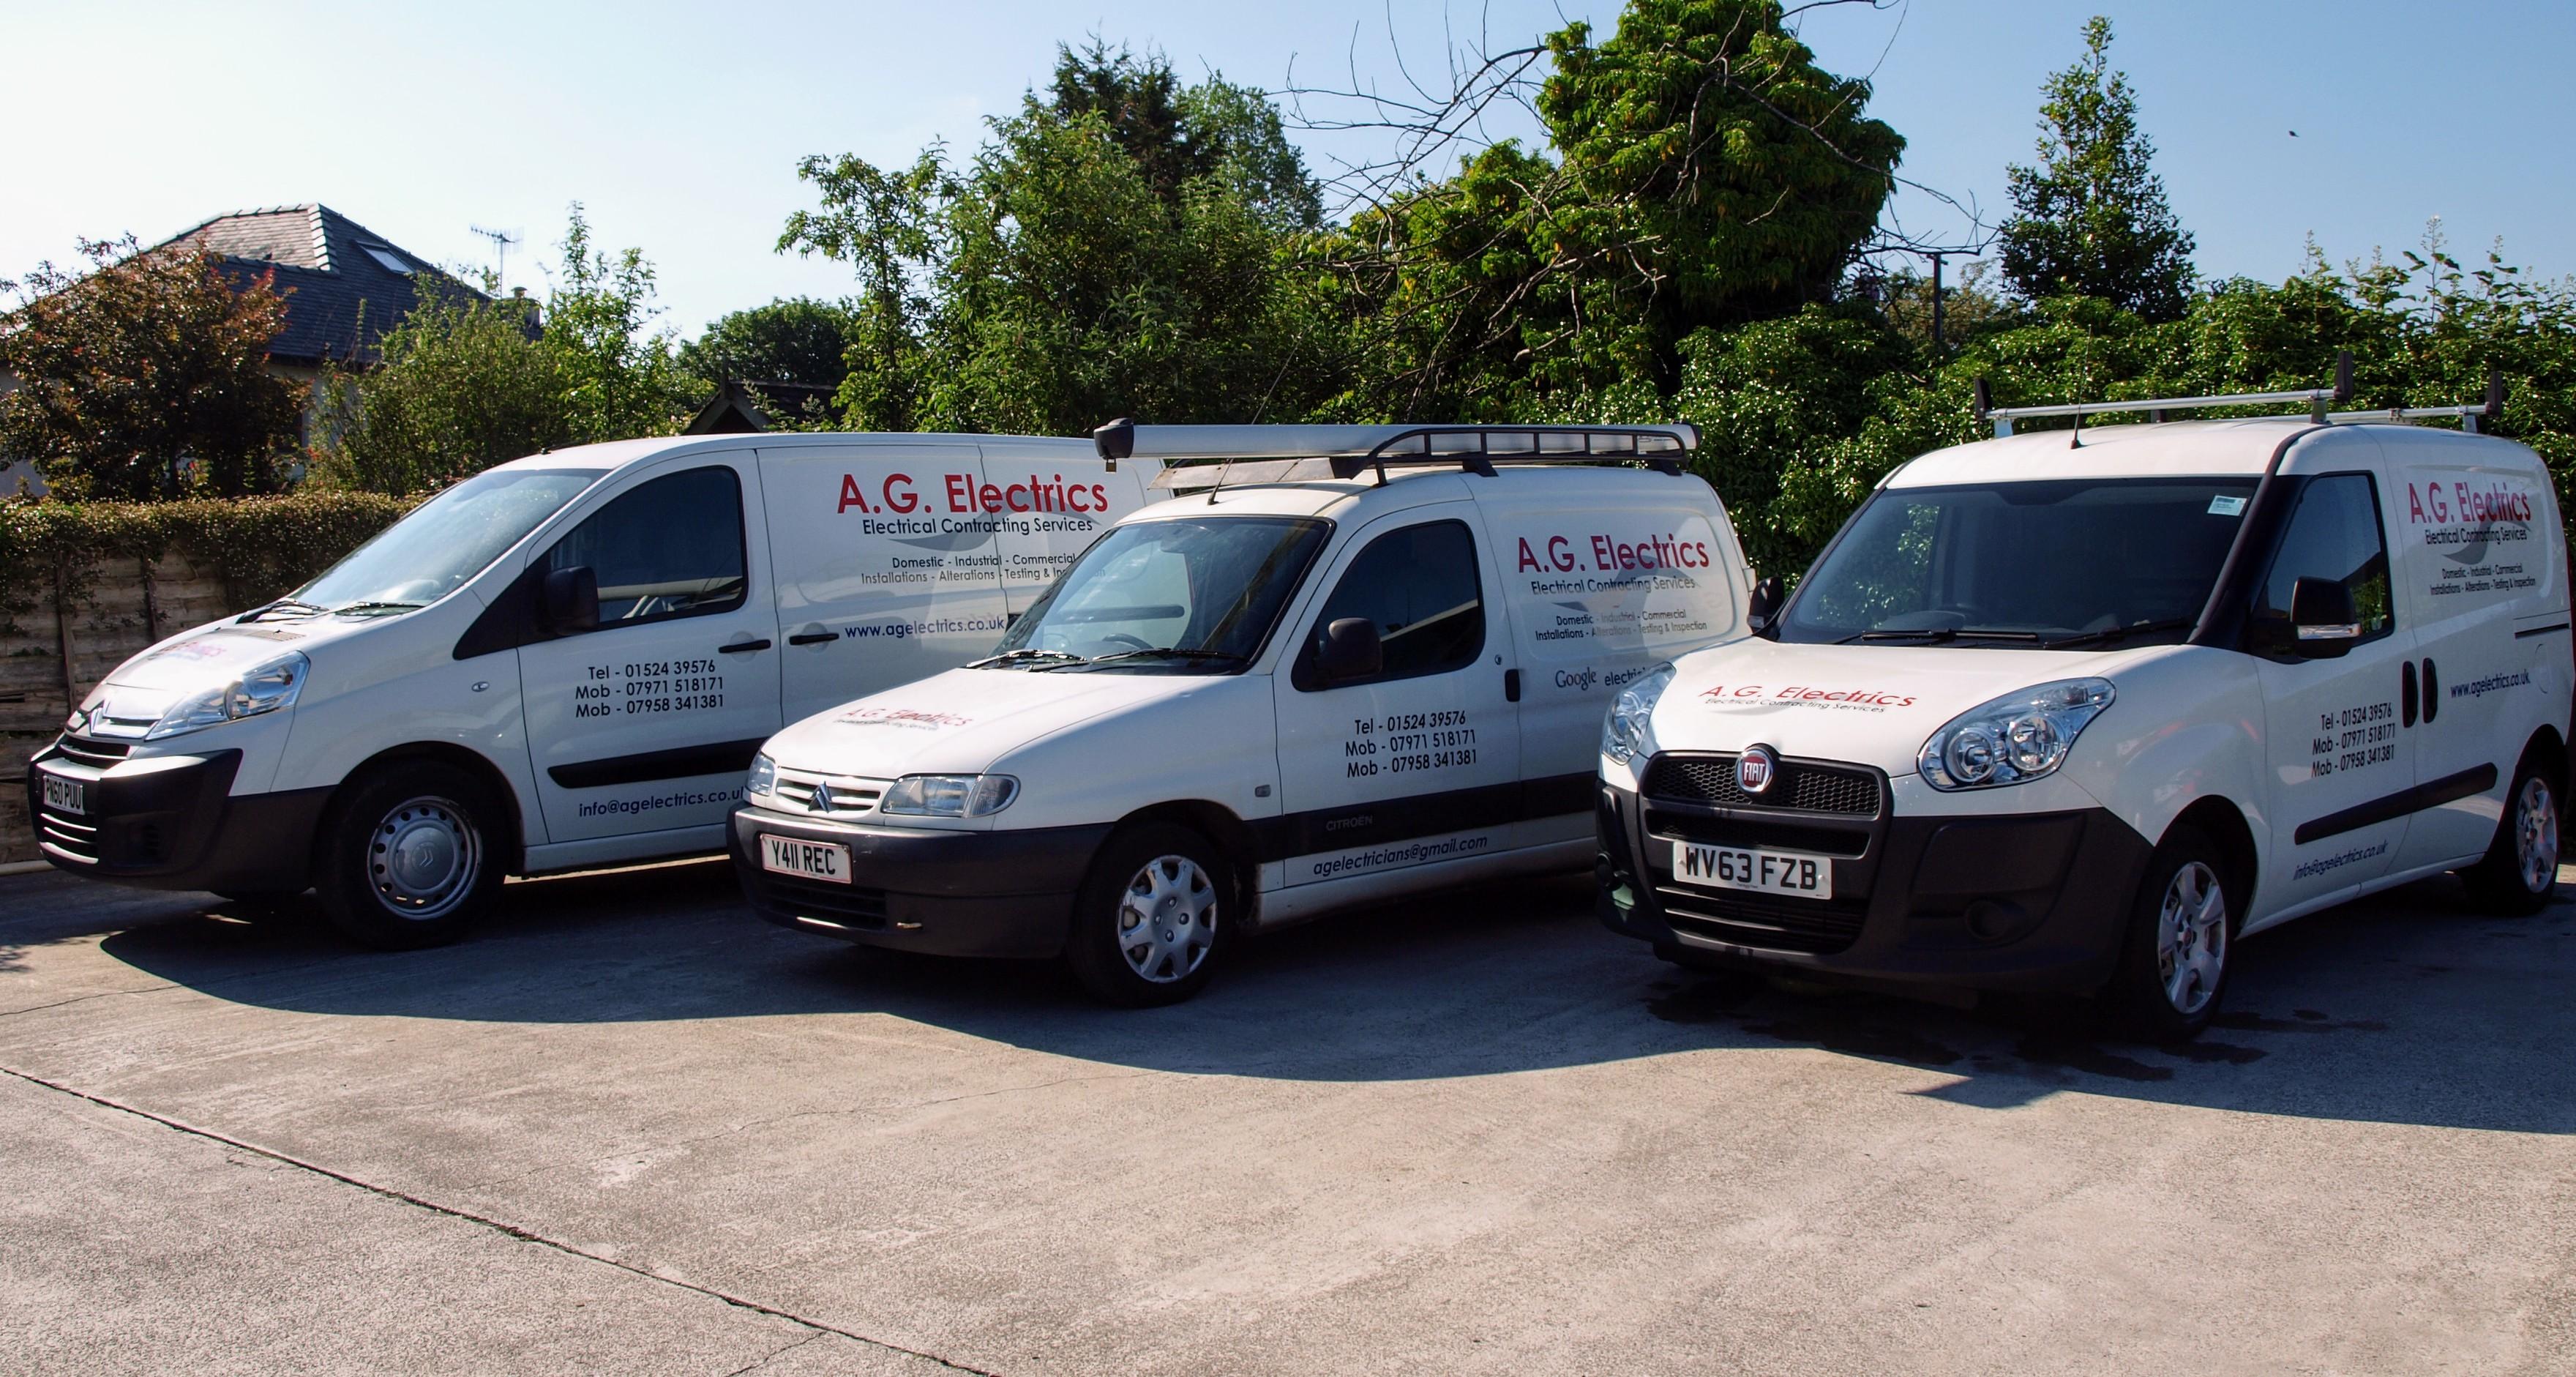 A.G. Electrics